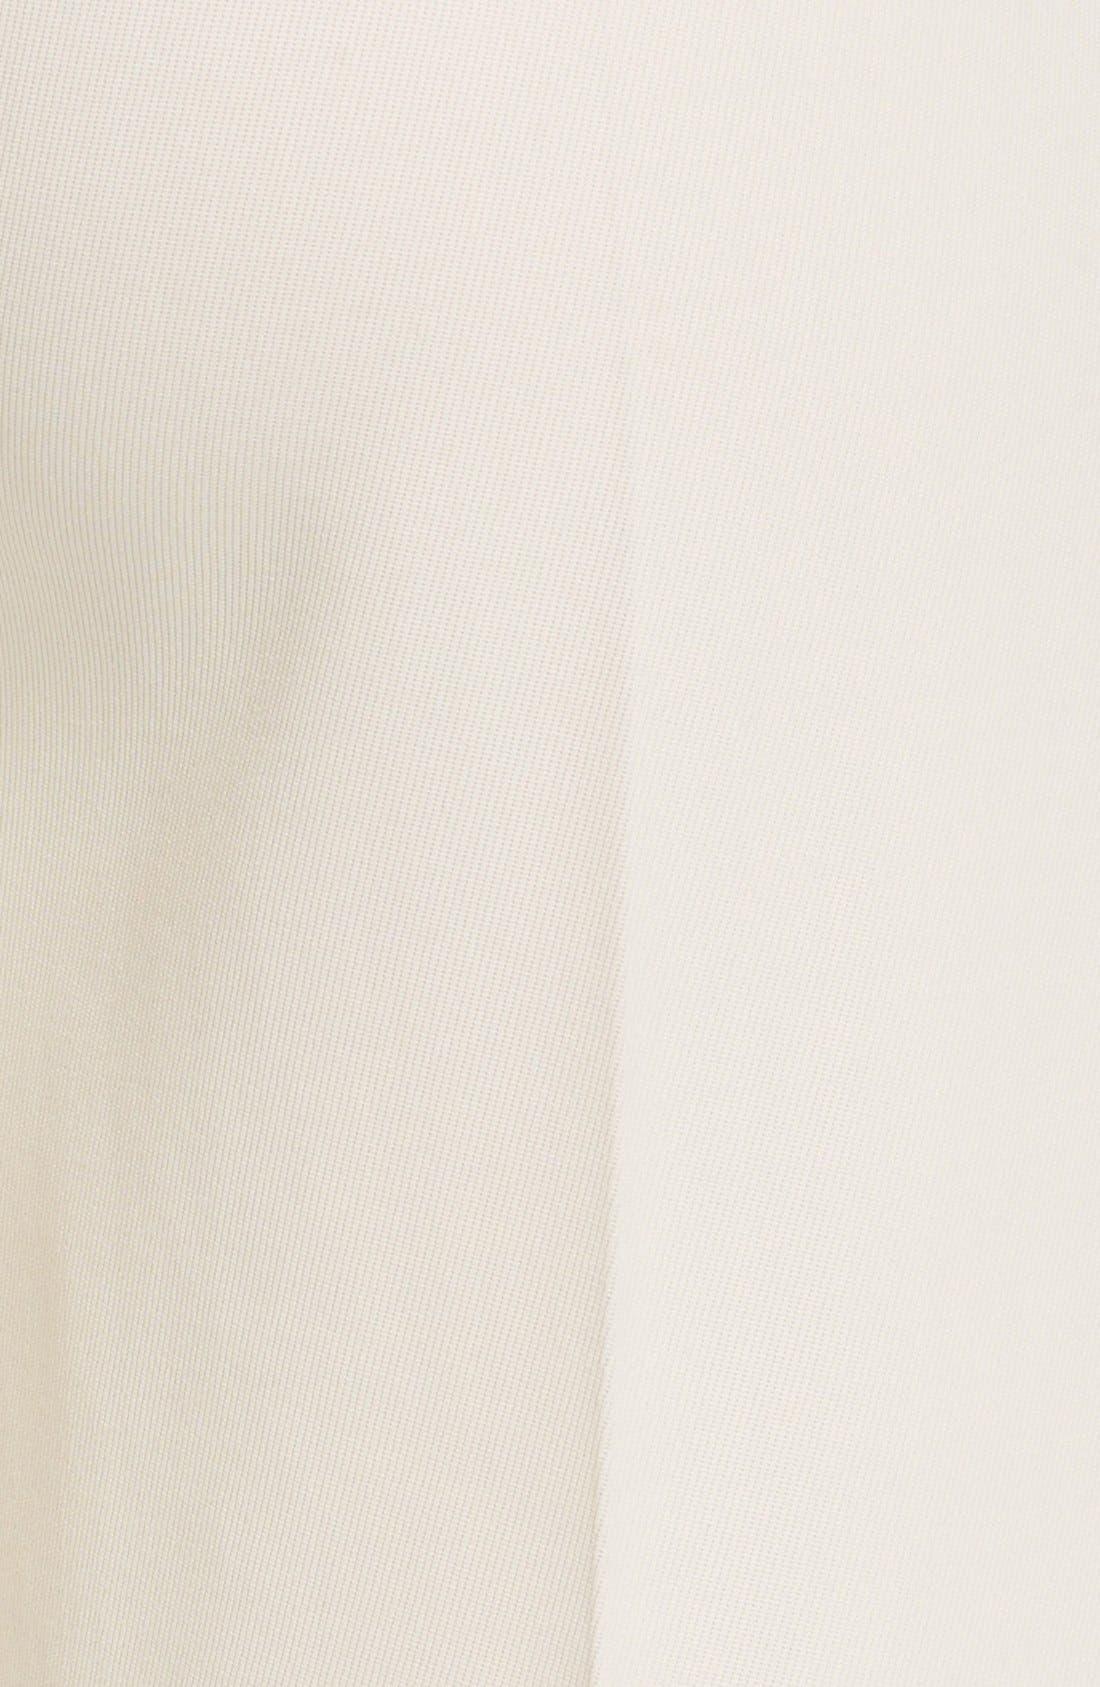 Alternate Image 3  - Stella McCartney 'Octavia' Crop Wool Trousers